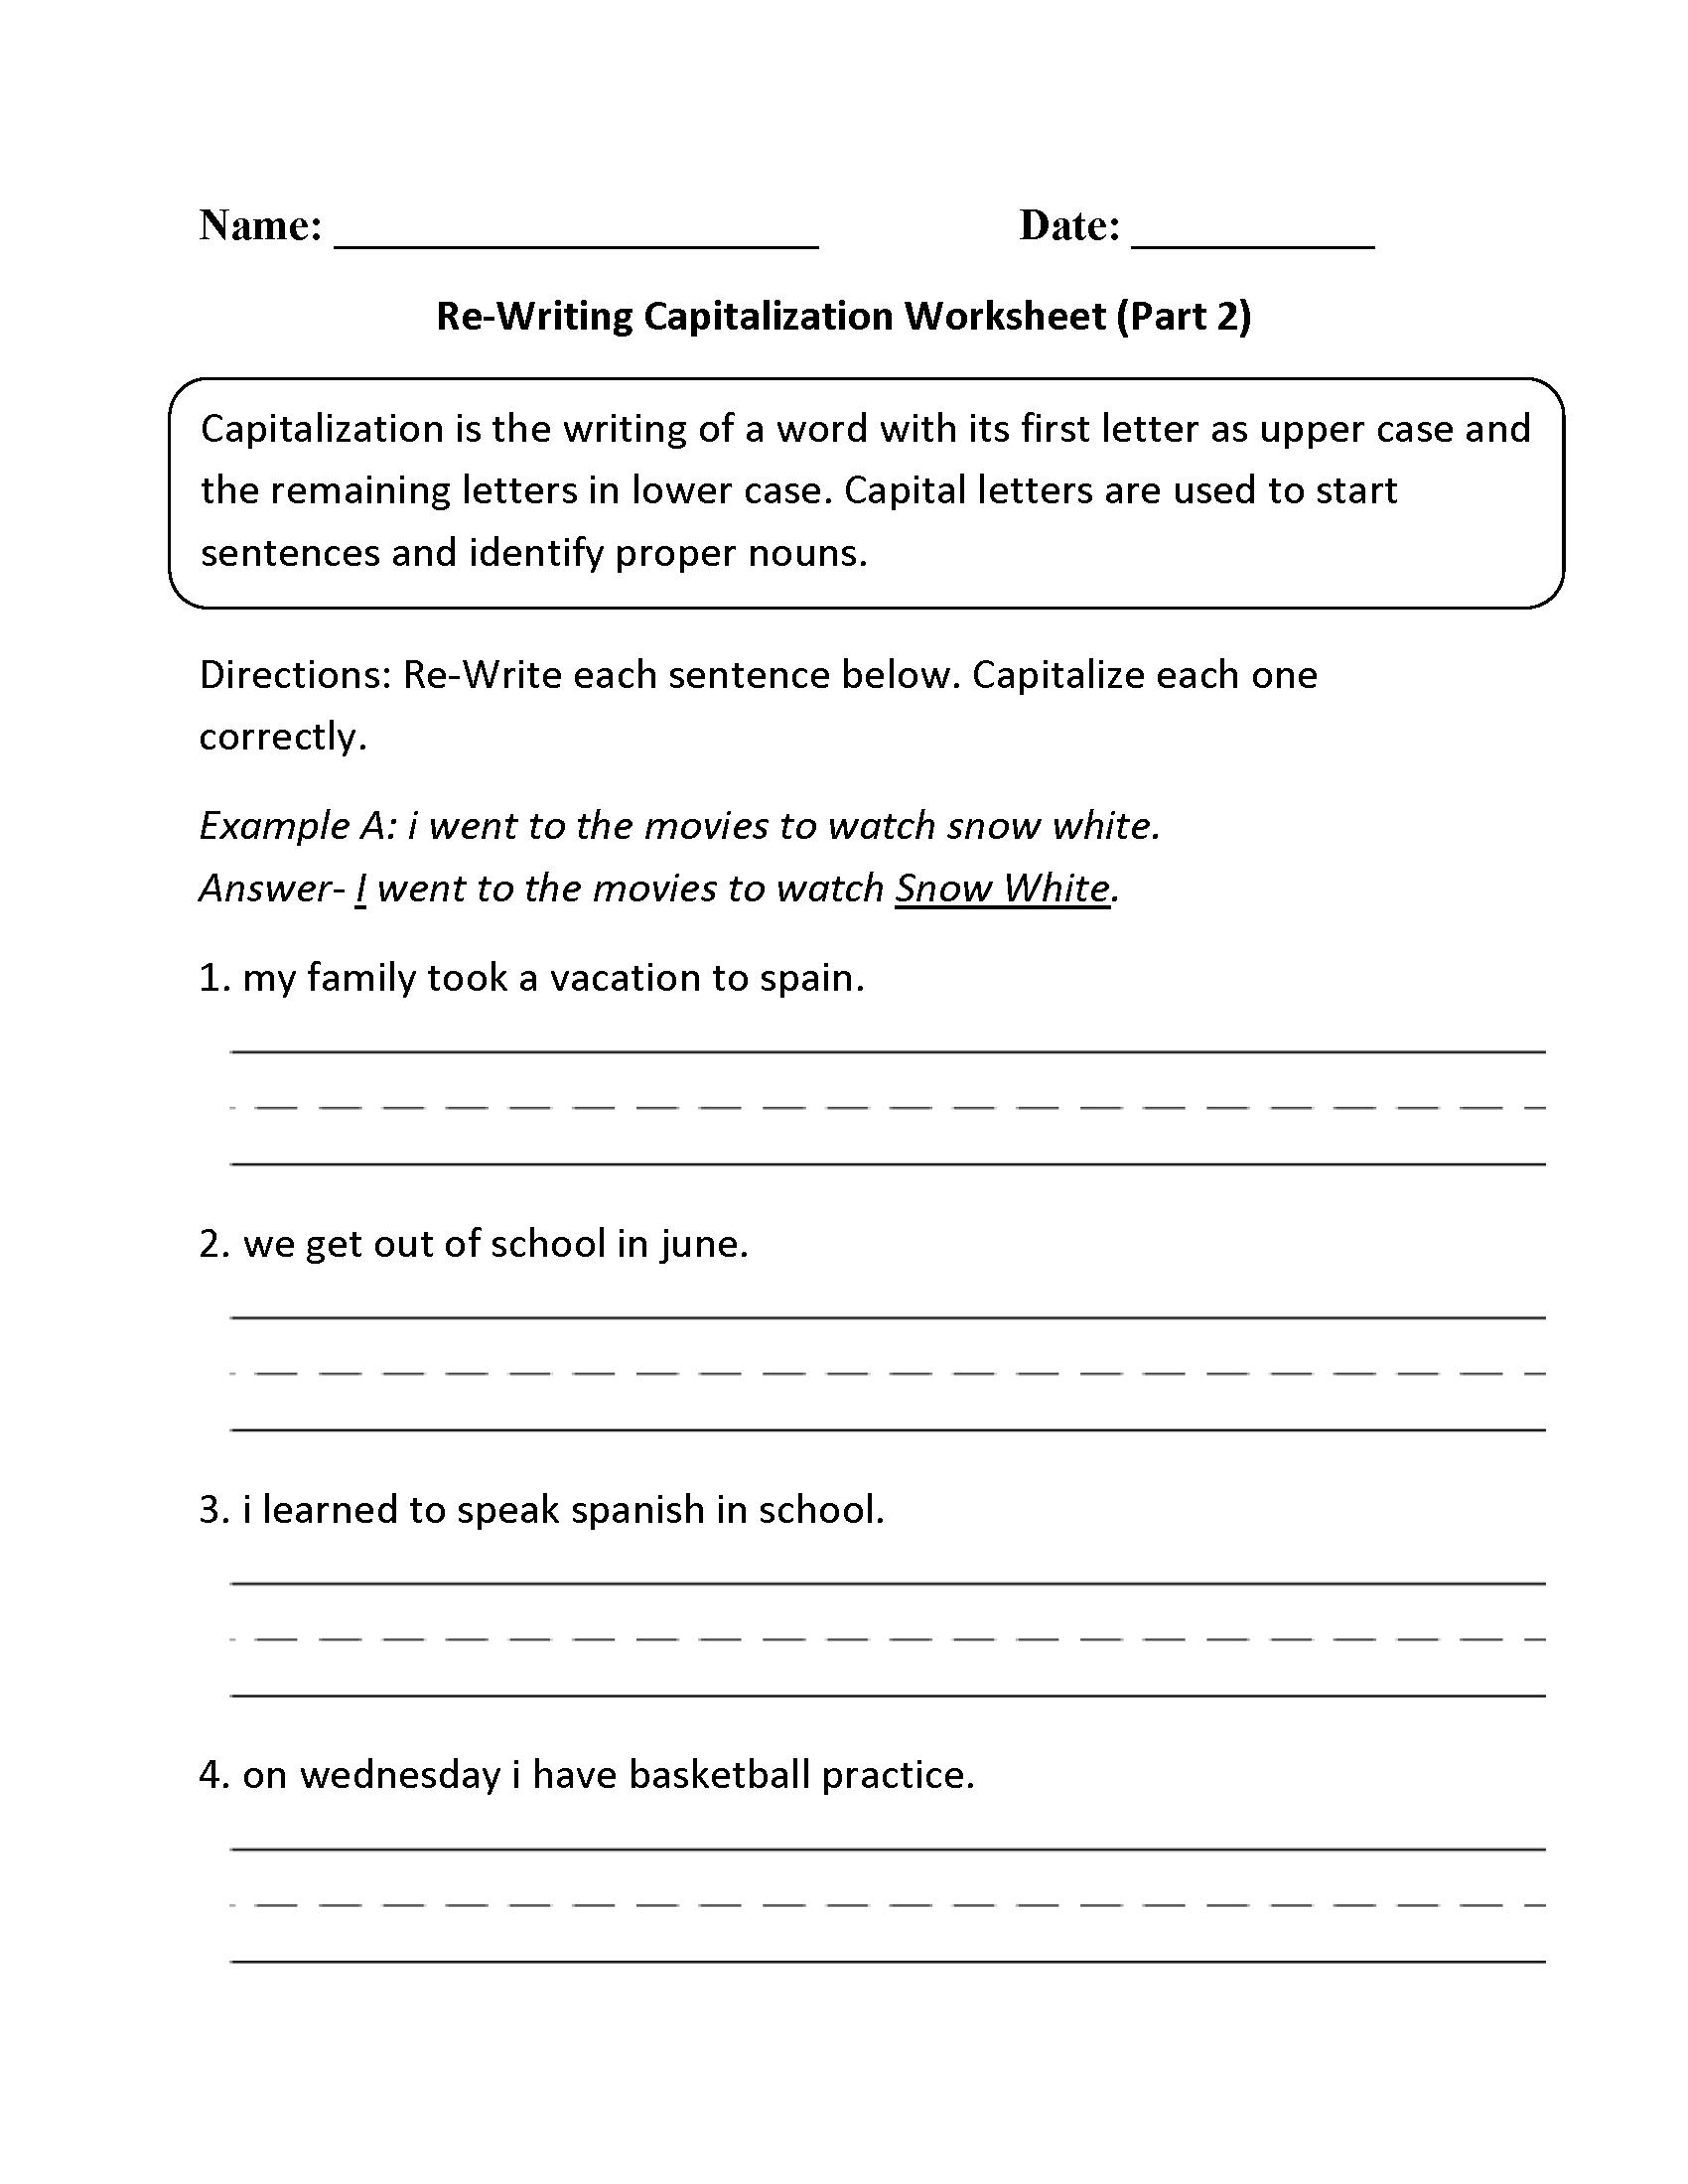 Re Writing Capitalization Worksheet Part 2